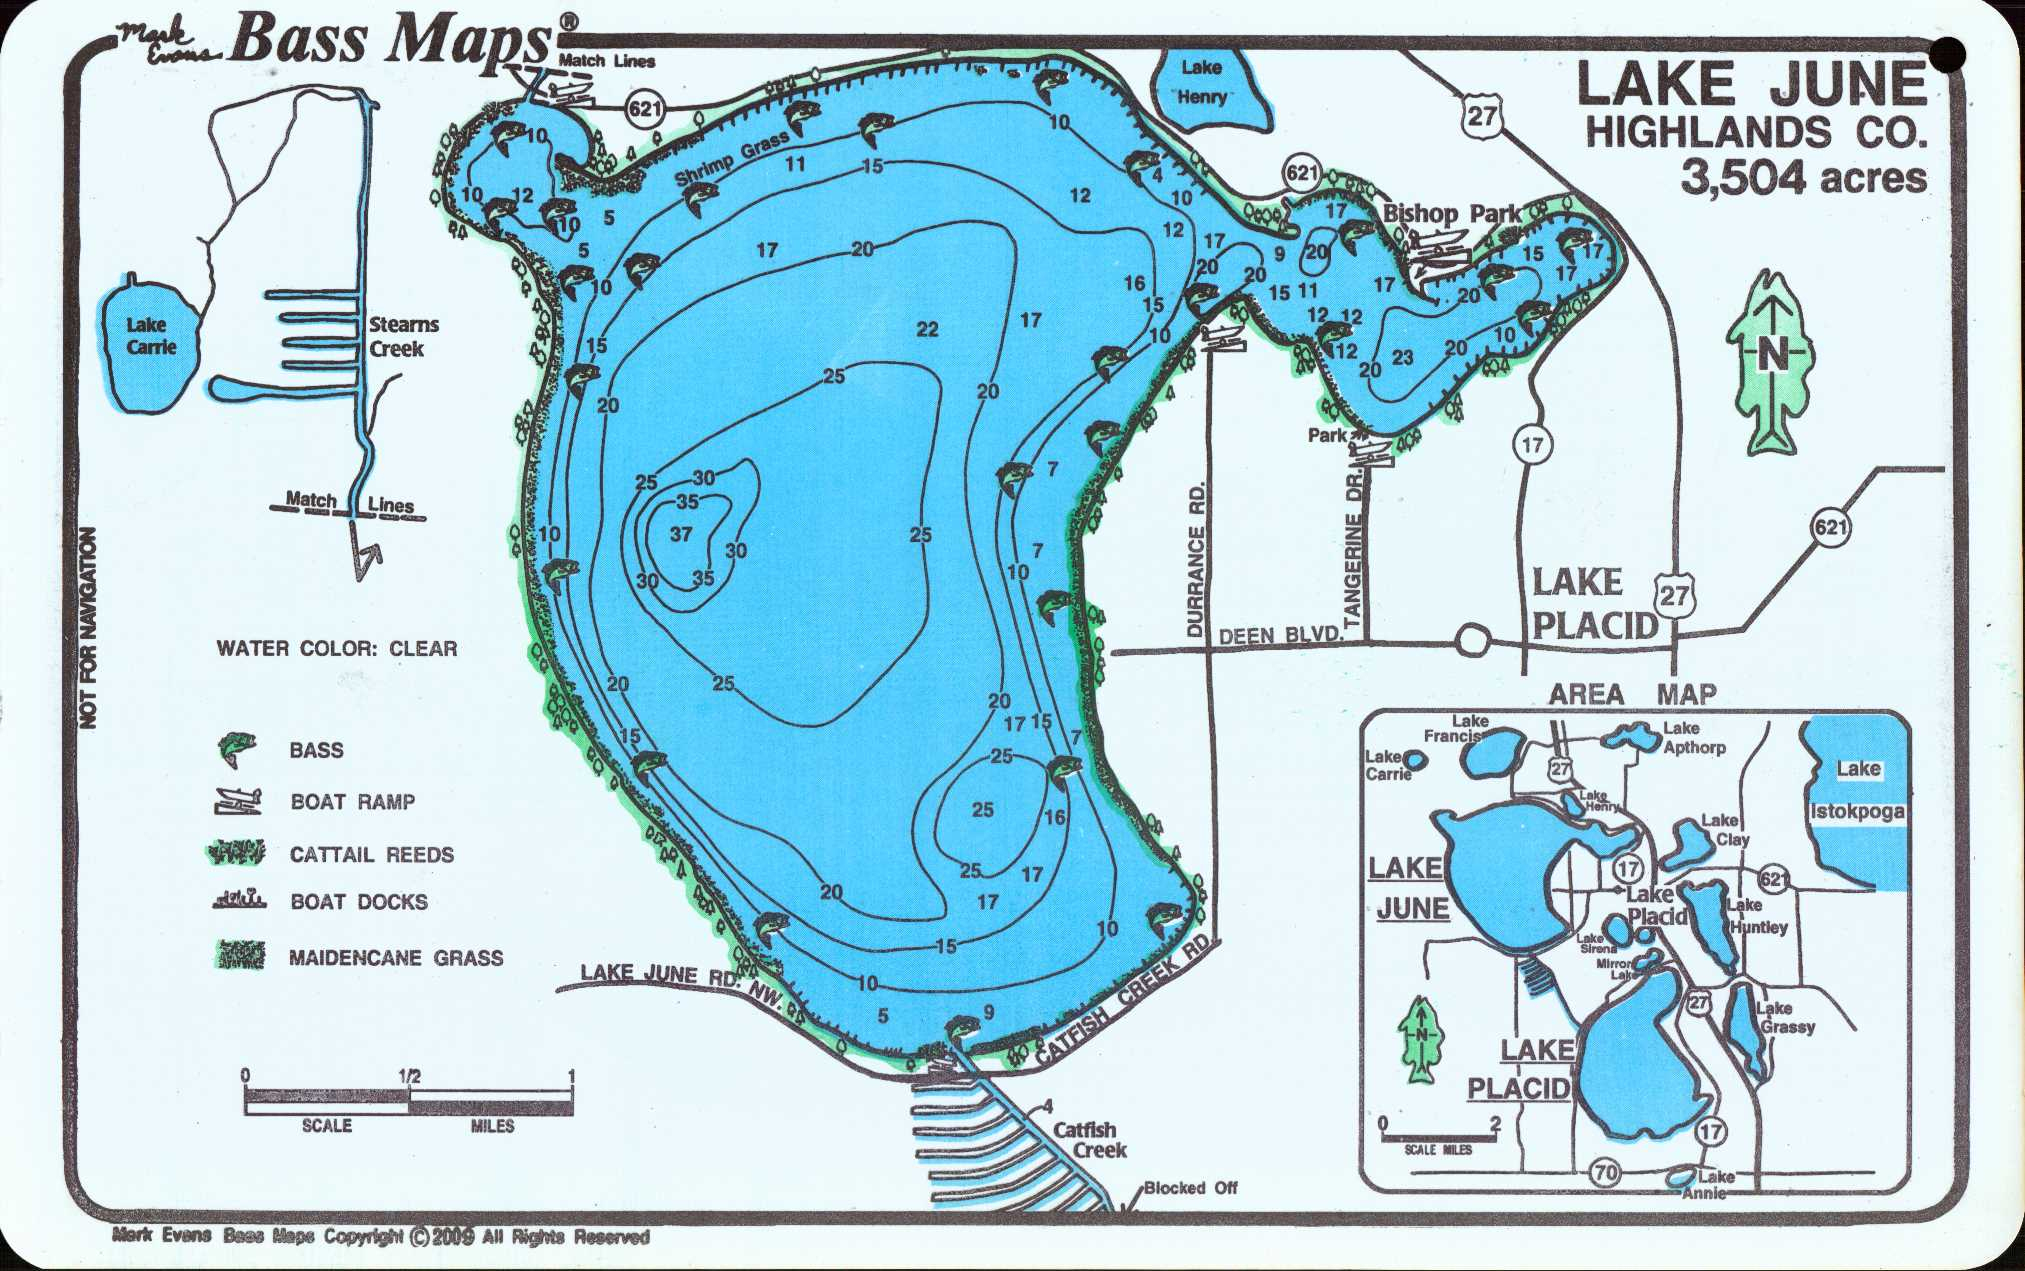 Lakes Placid / June Bass Map (2-Sided Map) - Mark Evans Maps - Florida Fishing Lakes Map